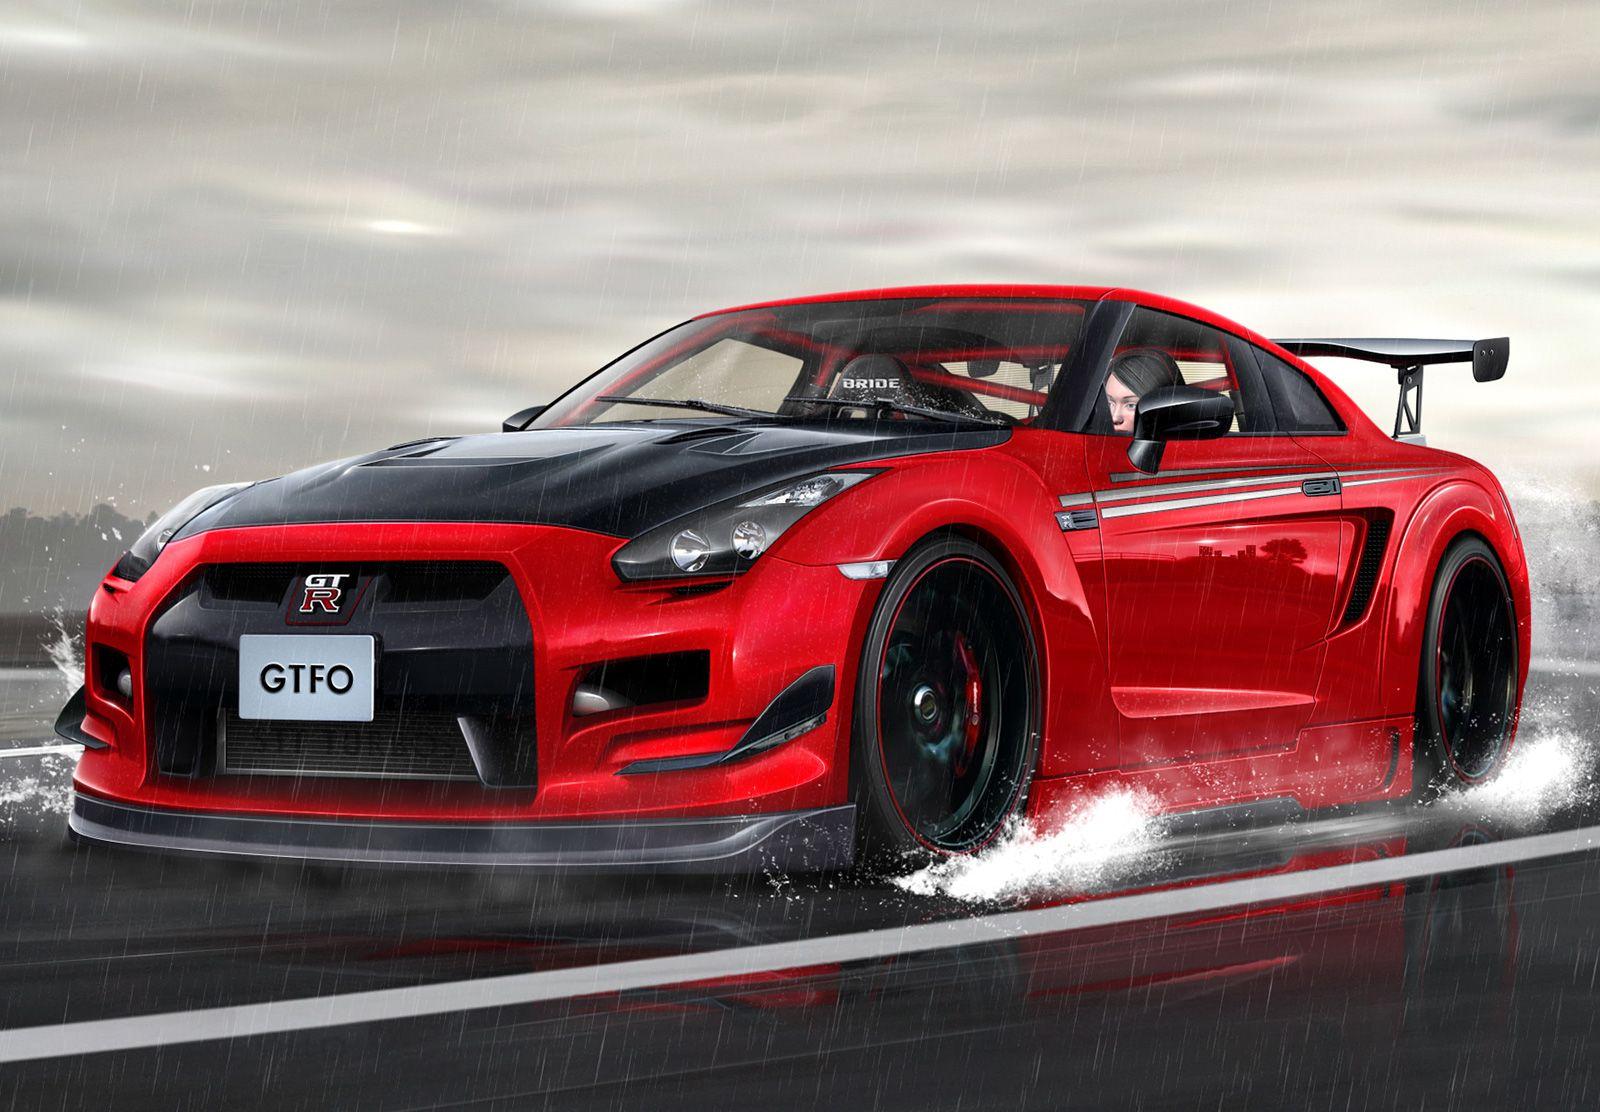 Nissan Skyline GTR Red R35 wallpaper Nissan skyline